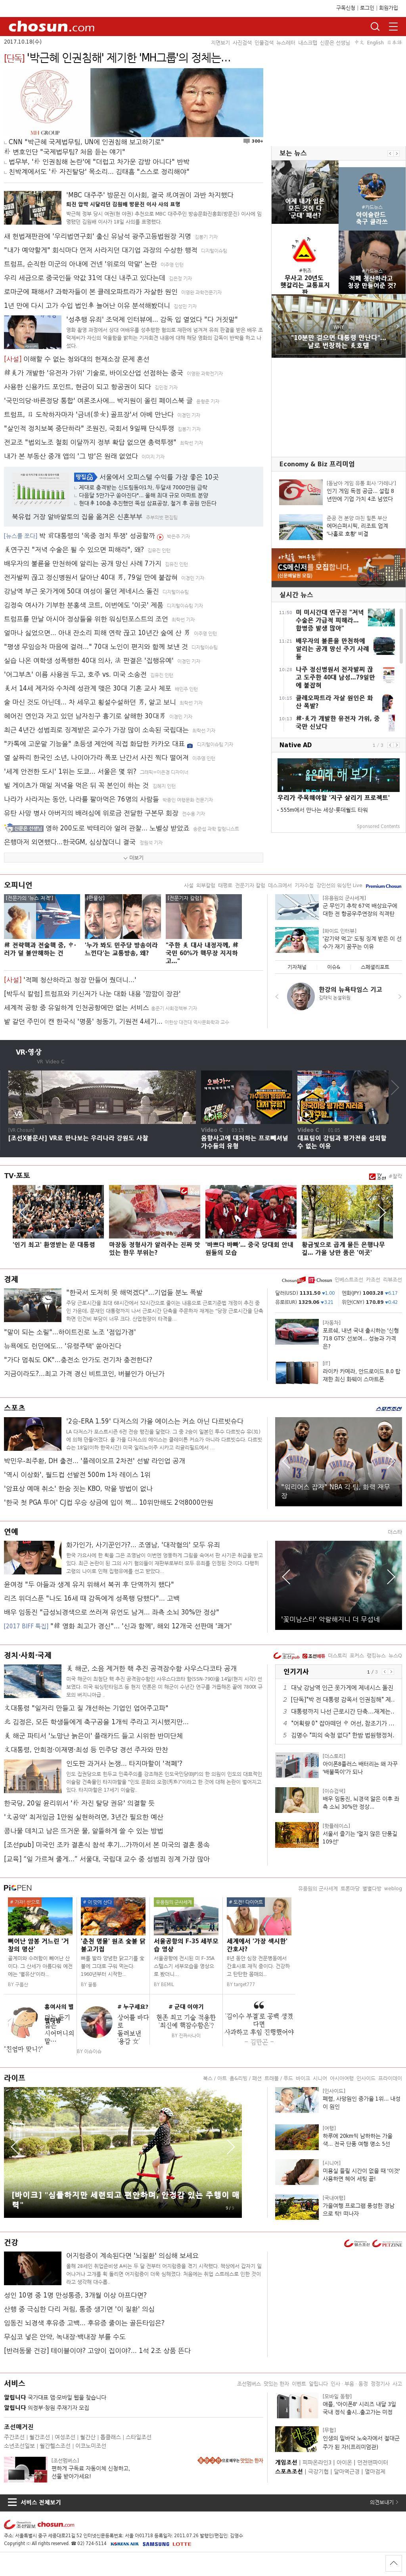 chosun.com at Wednesday Oct. 18, 2017, 12:02 p.m. UTC